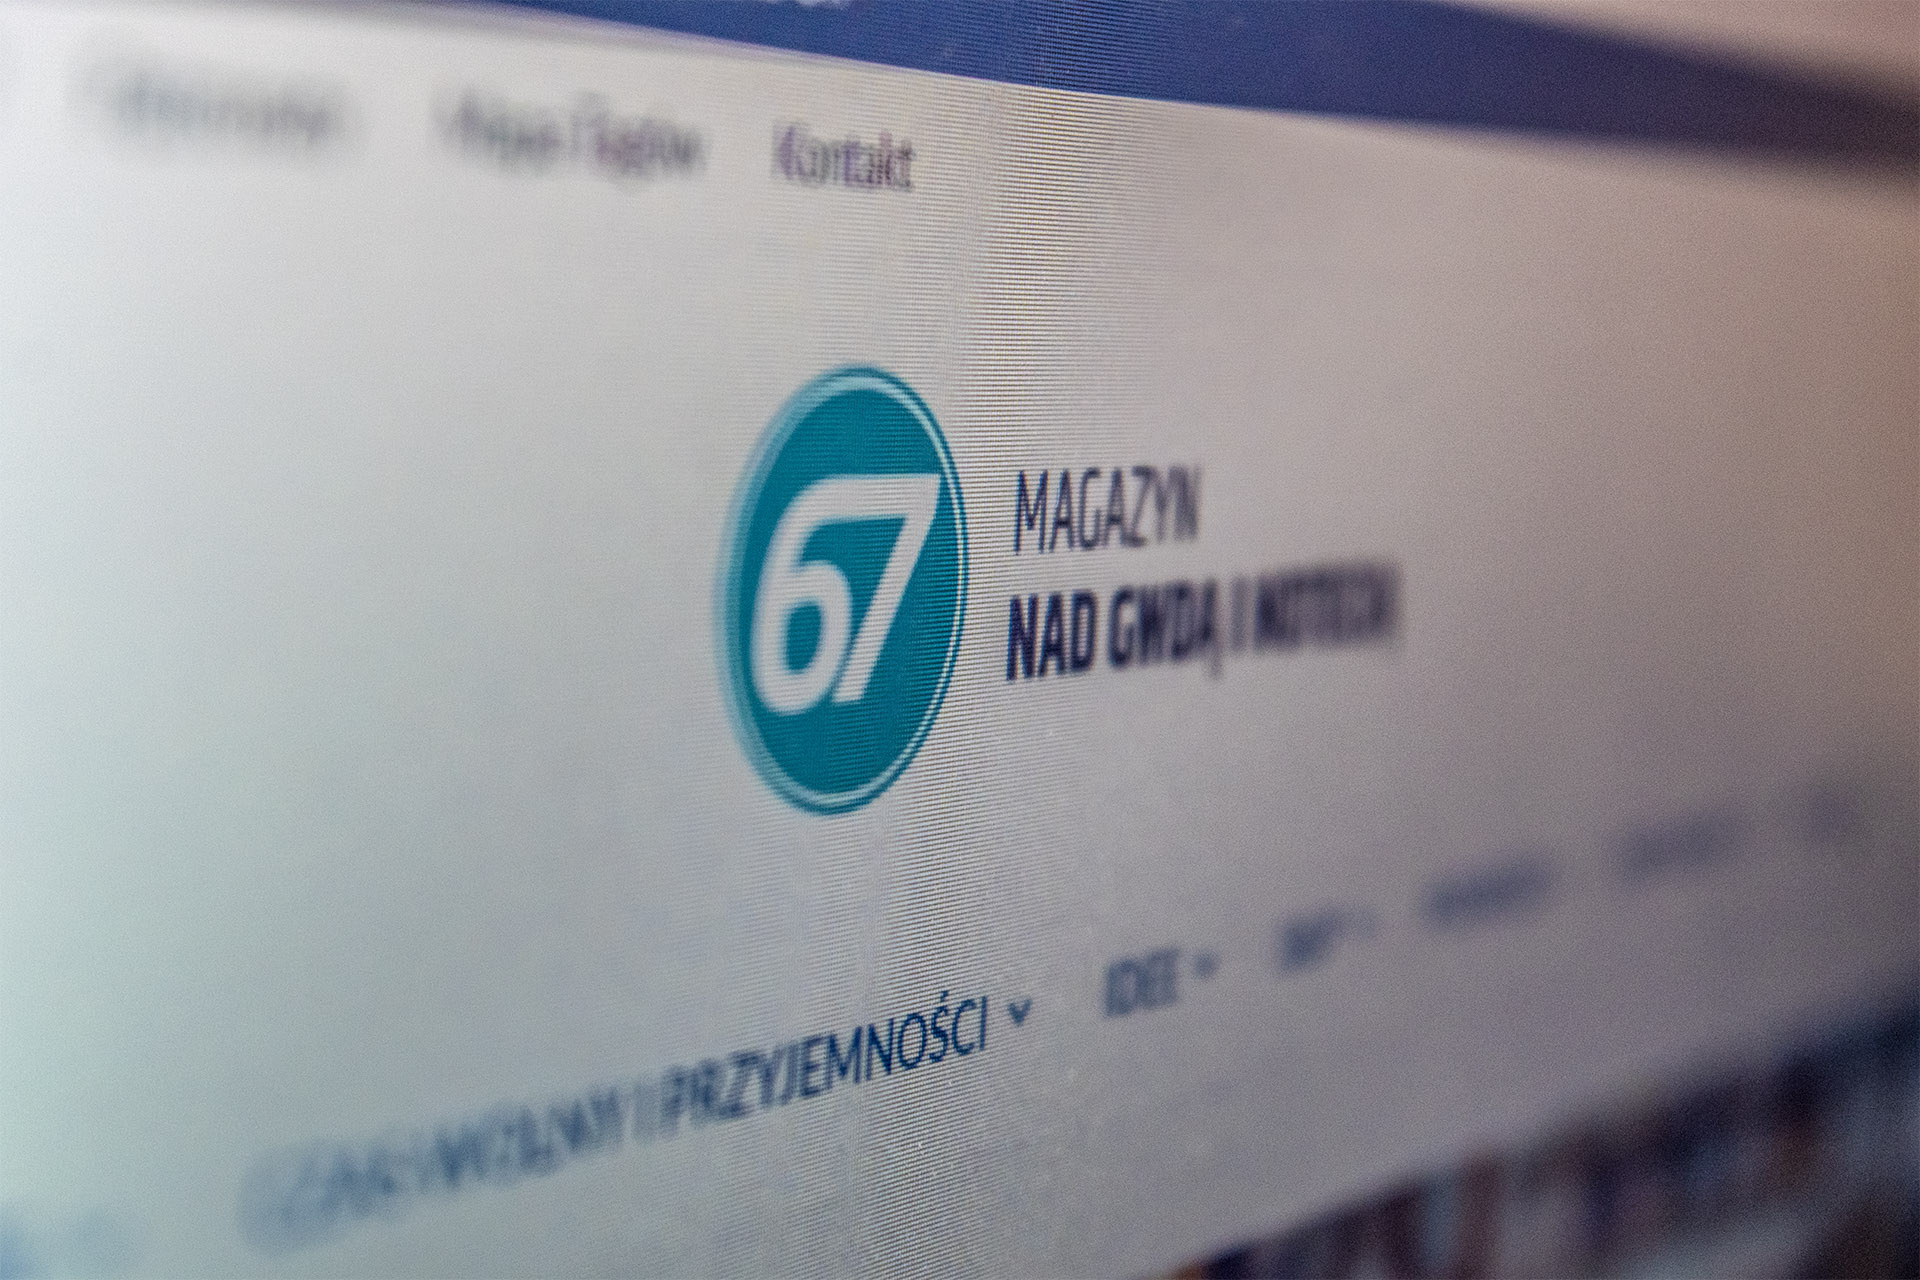 Magazyn67.pl. Fot. Marcin Maziarz